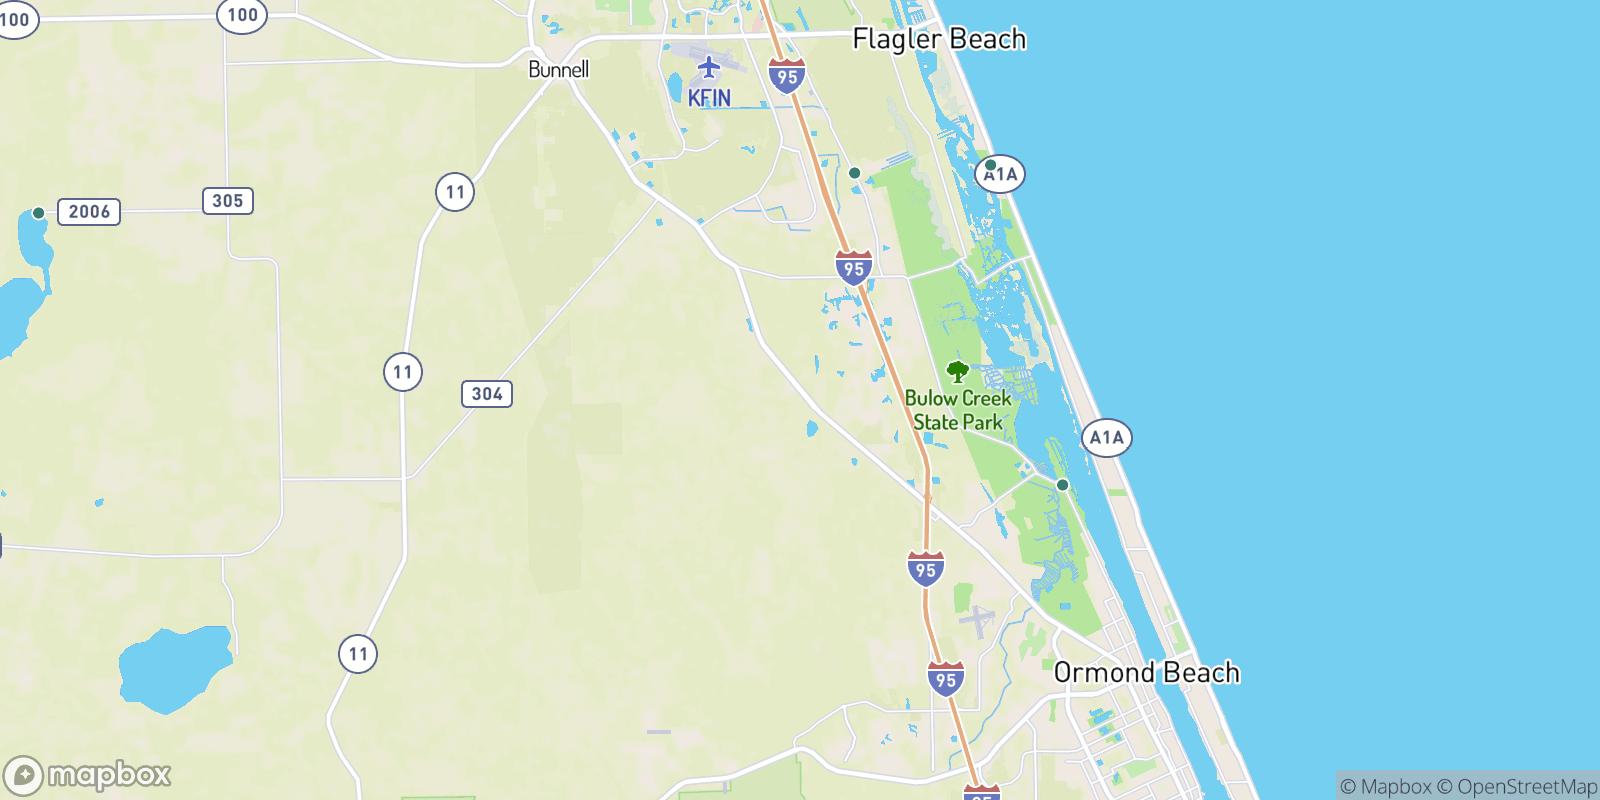 The best camping near Favoretta, Florida